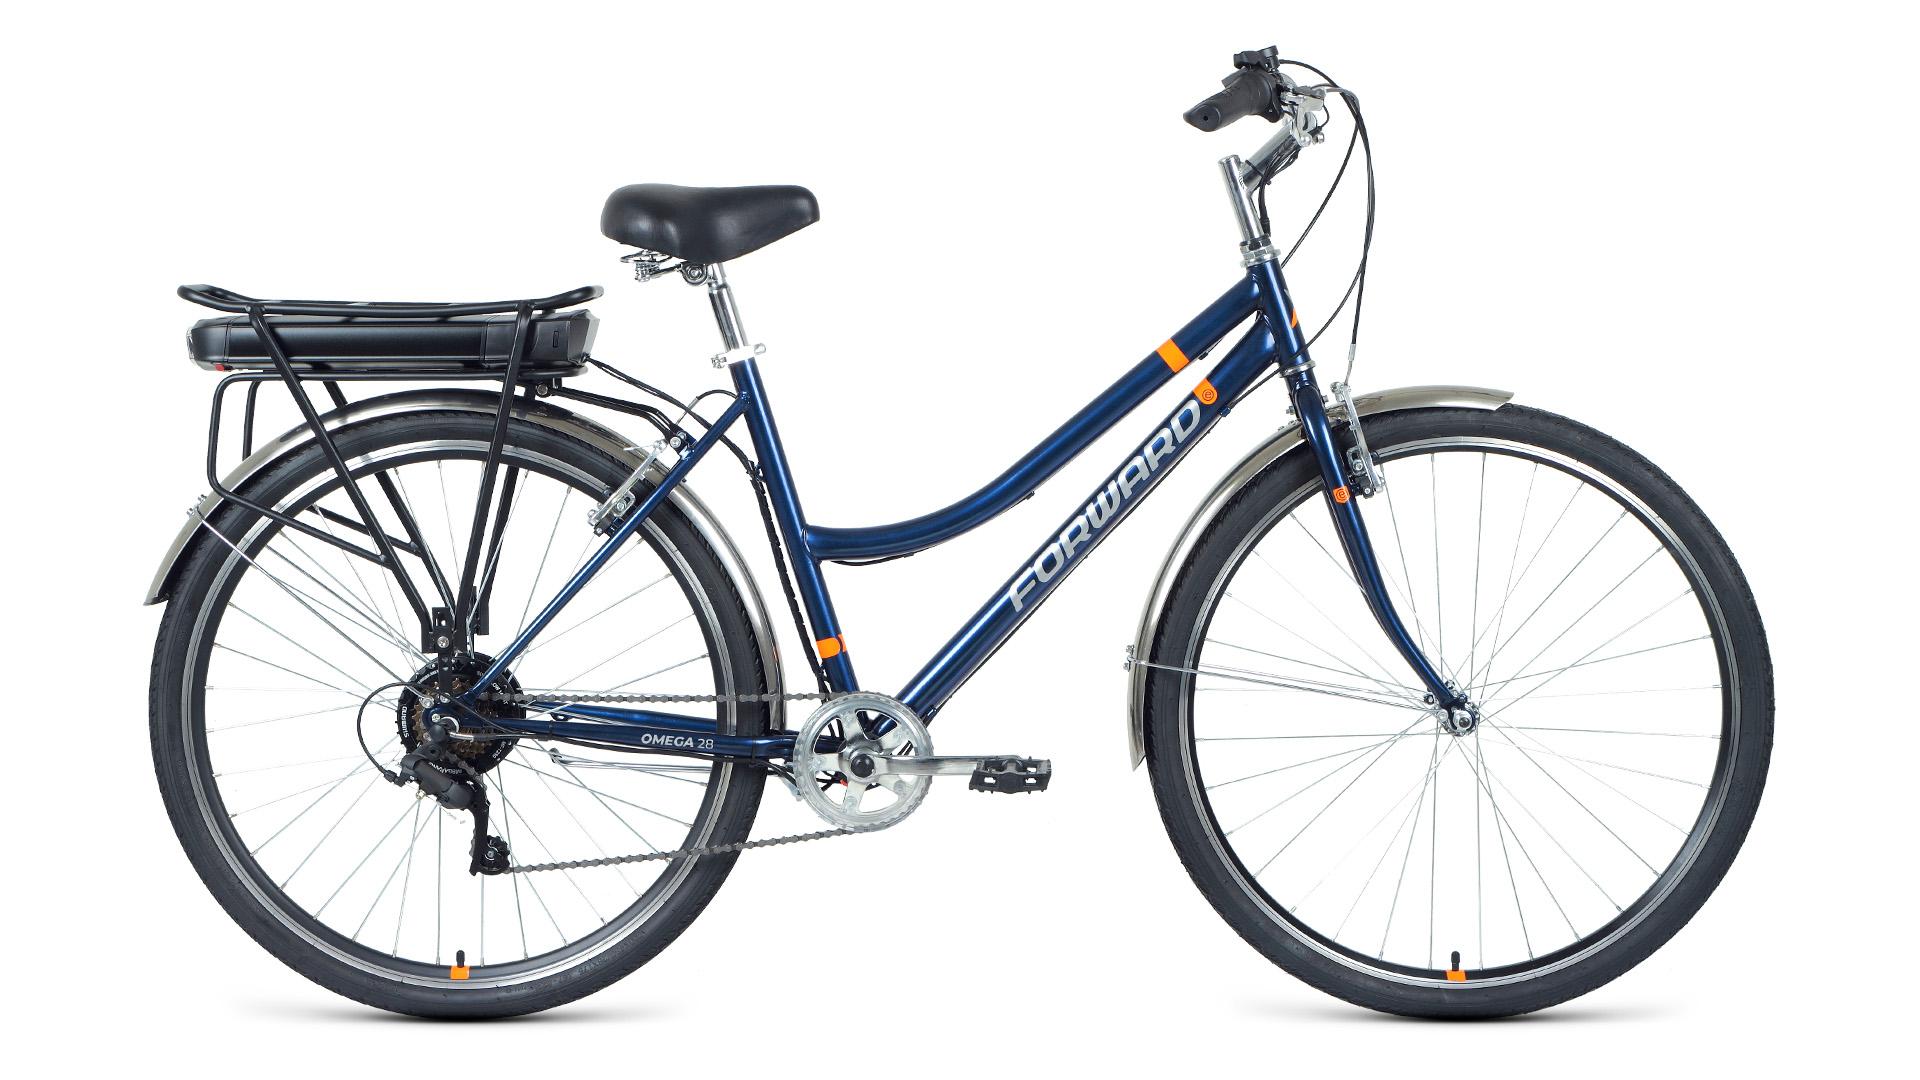 Электровелосипед Forward OMEGA 28 250w (2021)